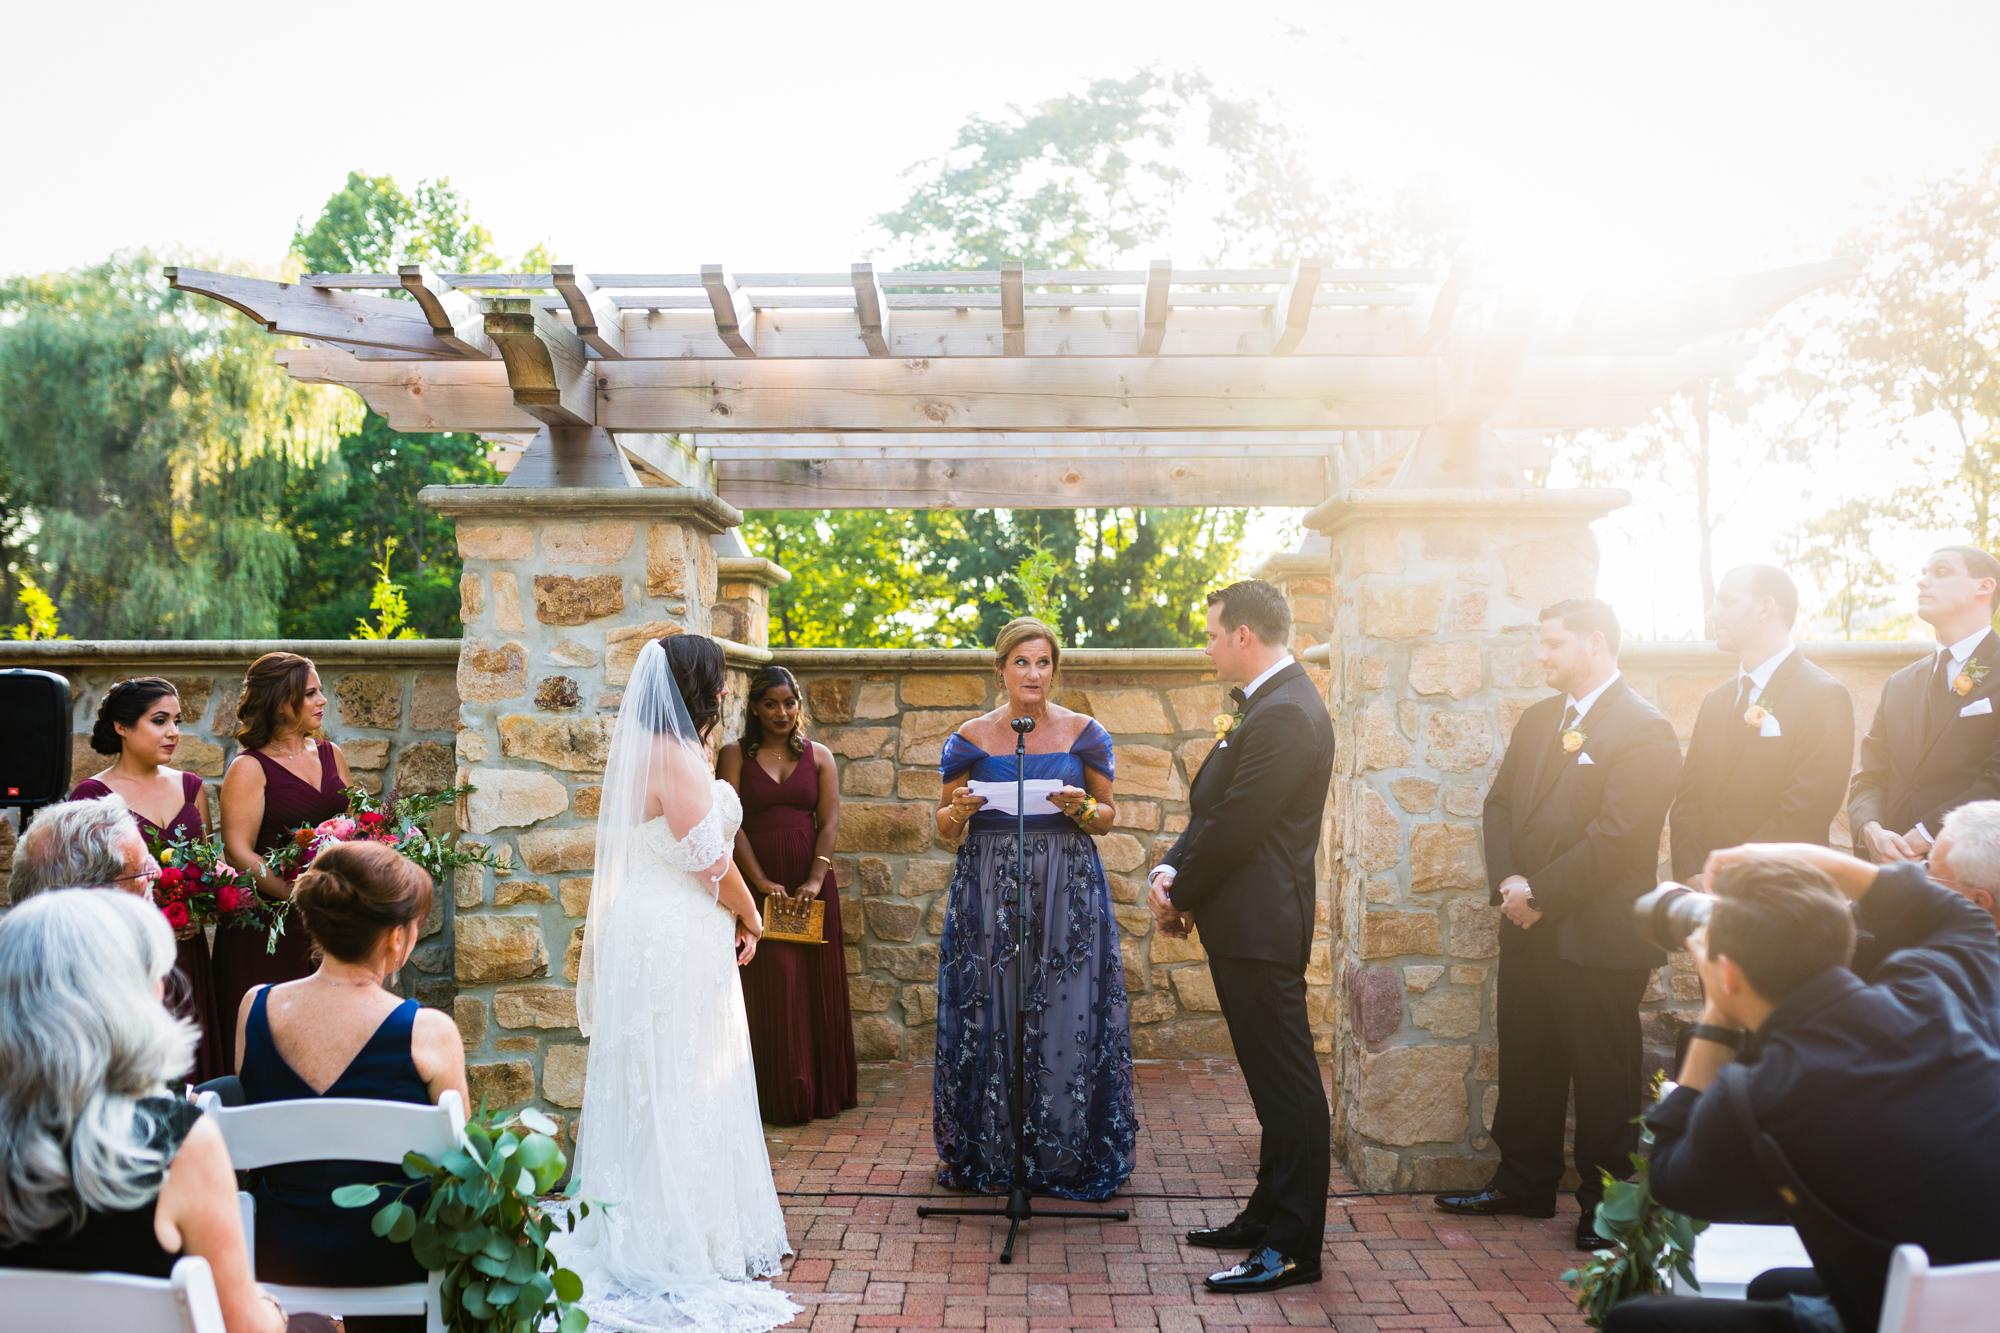 Hotel Du Village - LoveStruck Pictures - Wedding Photography-068.jpg